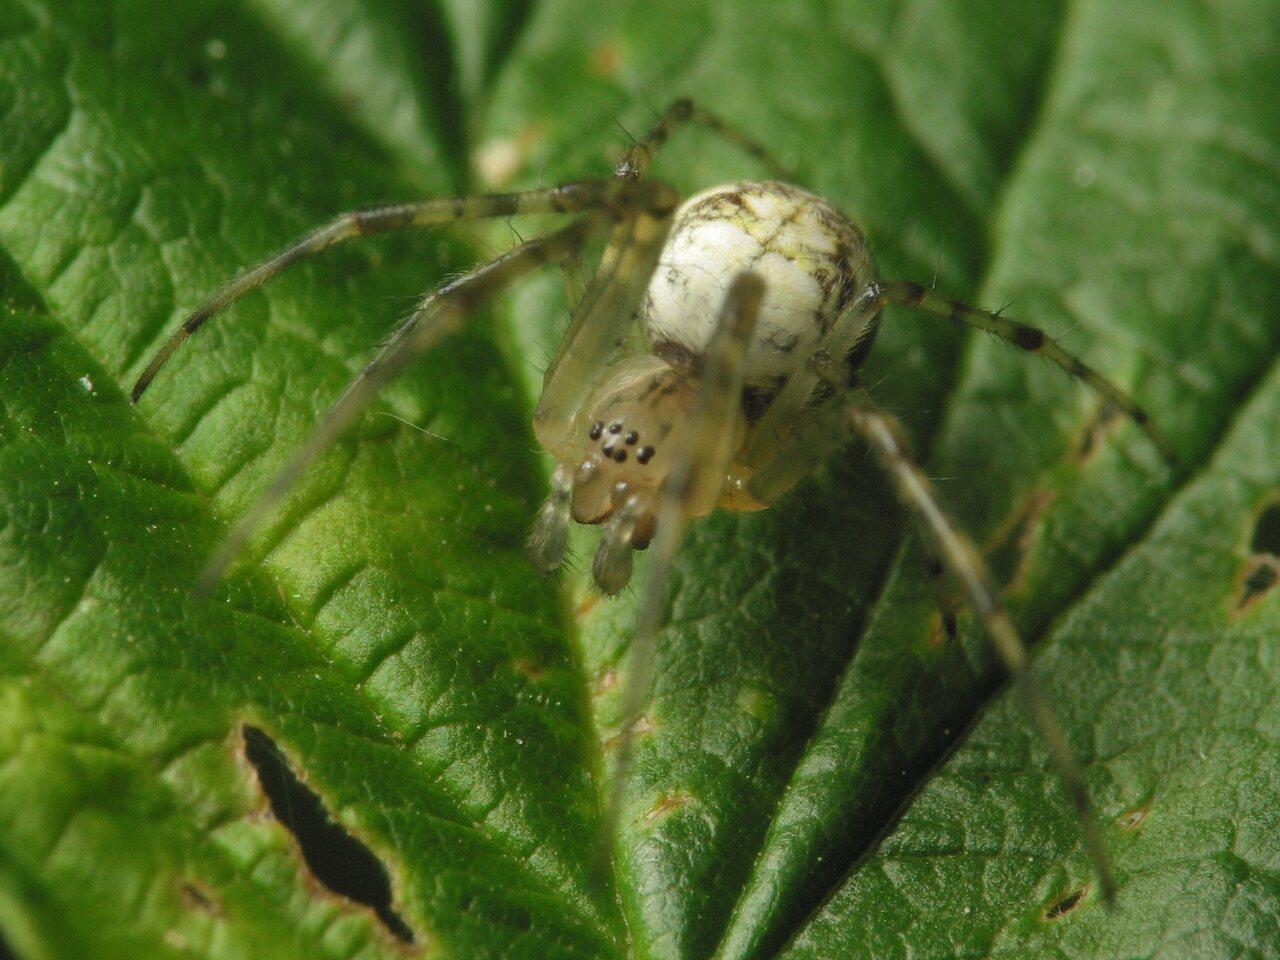 Araneae-4193.jpg